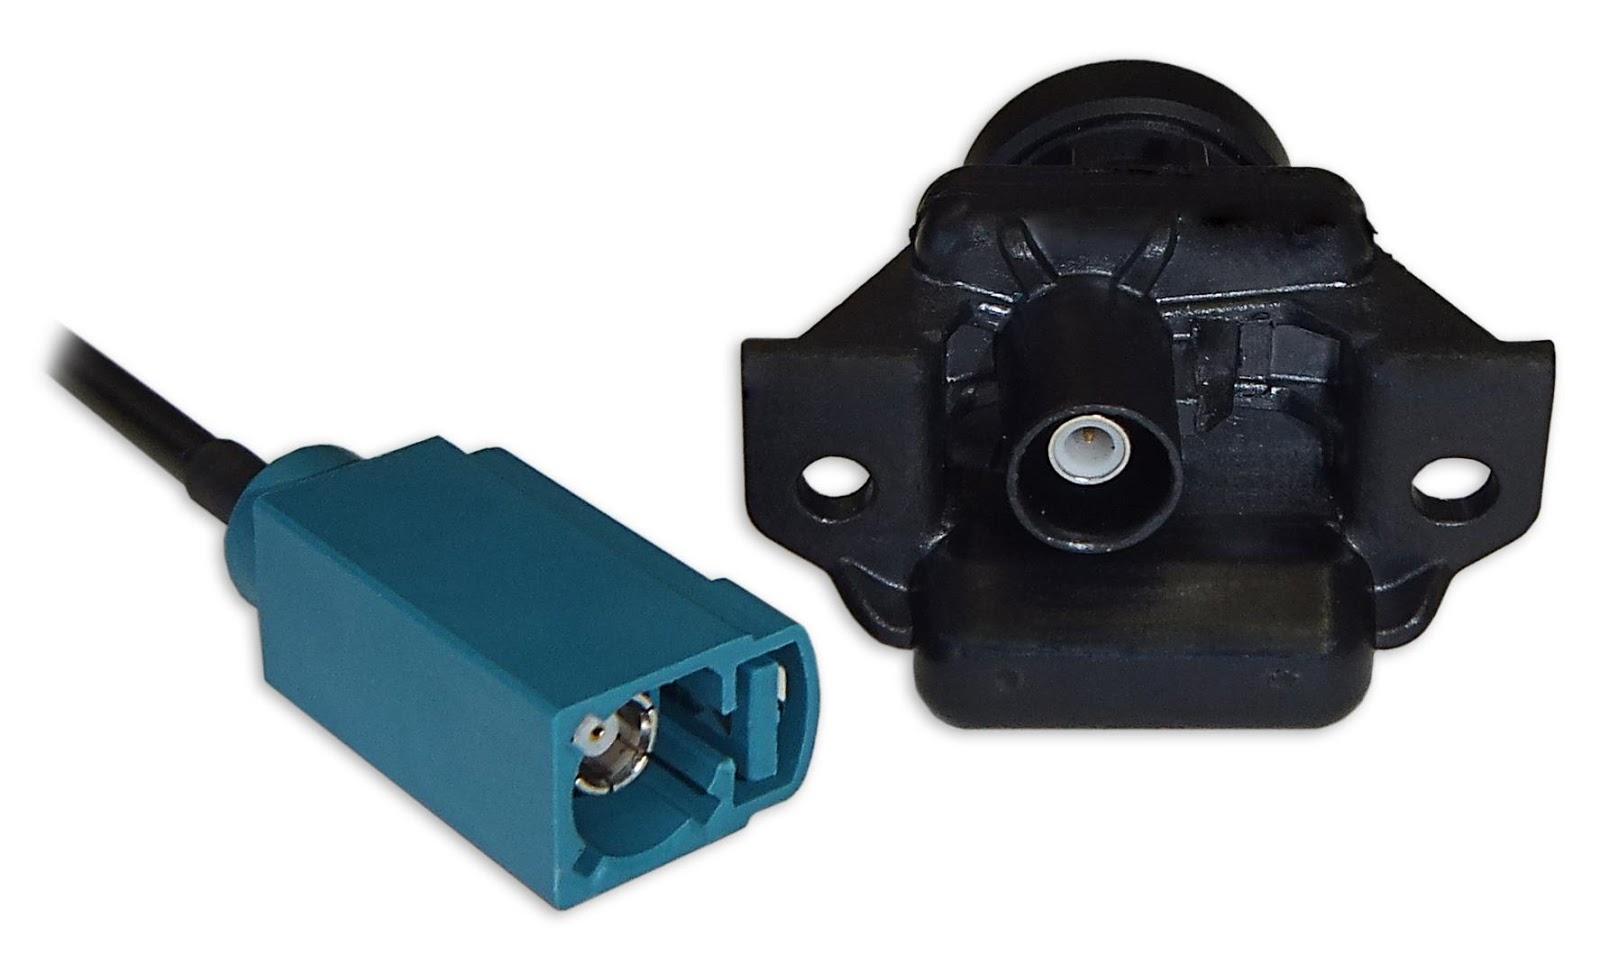 Video Technology: Gigabit Multimedia Serial Link (GMSL)